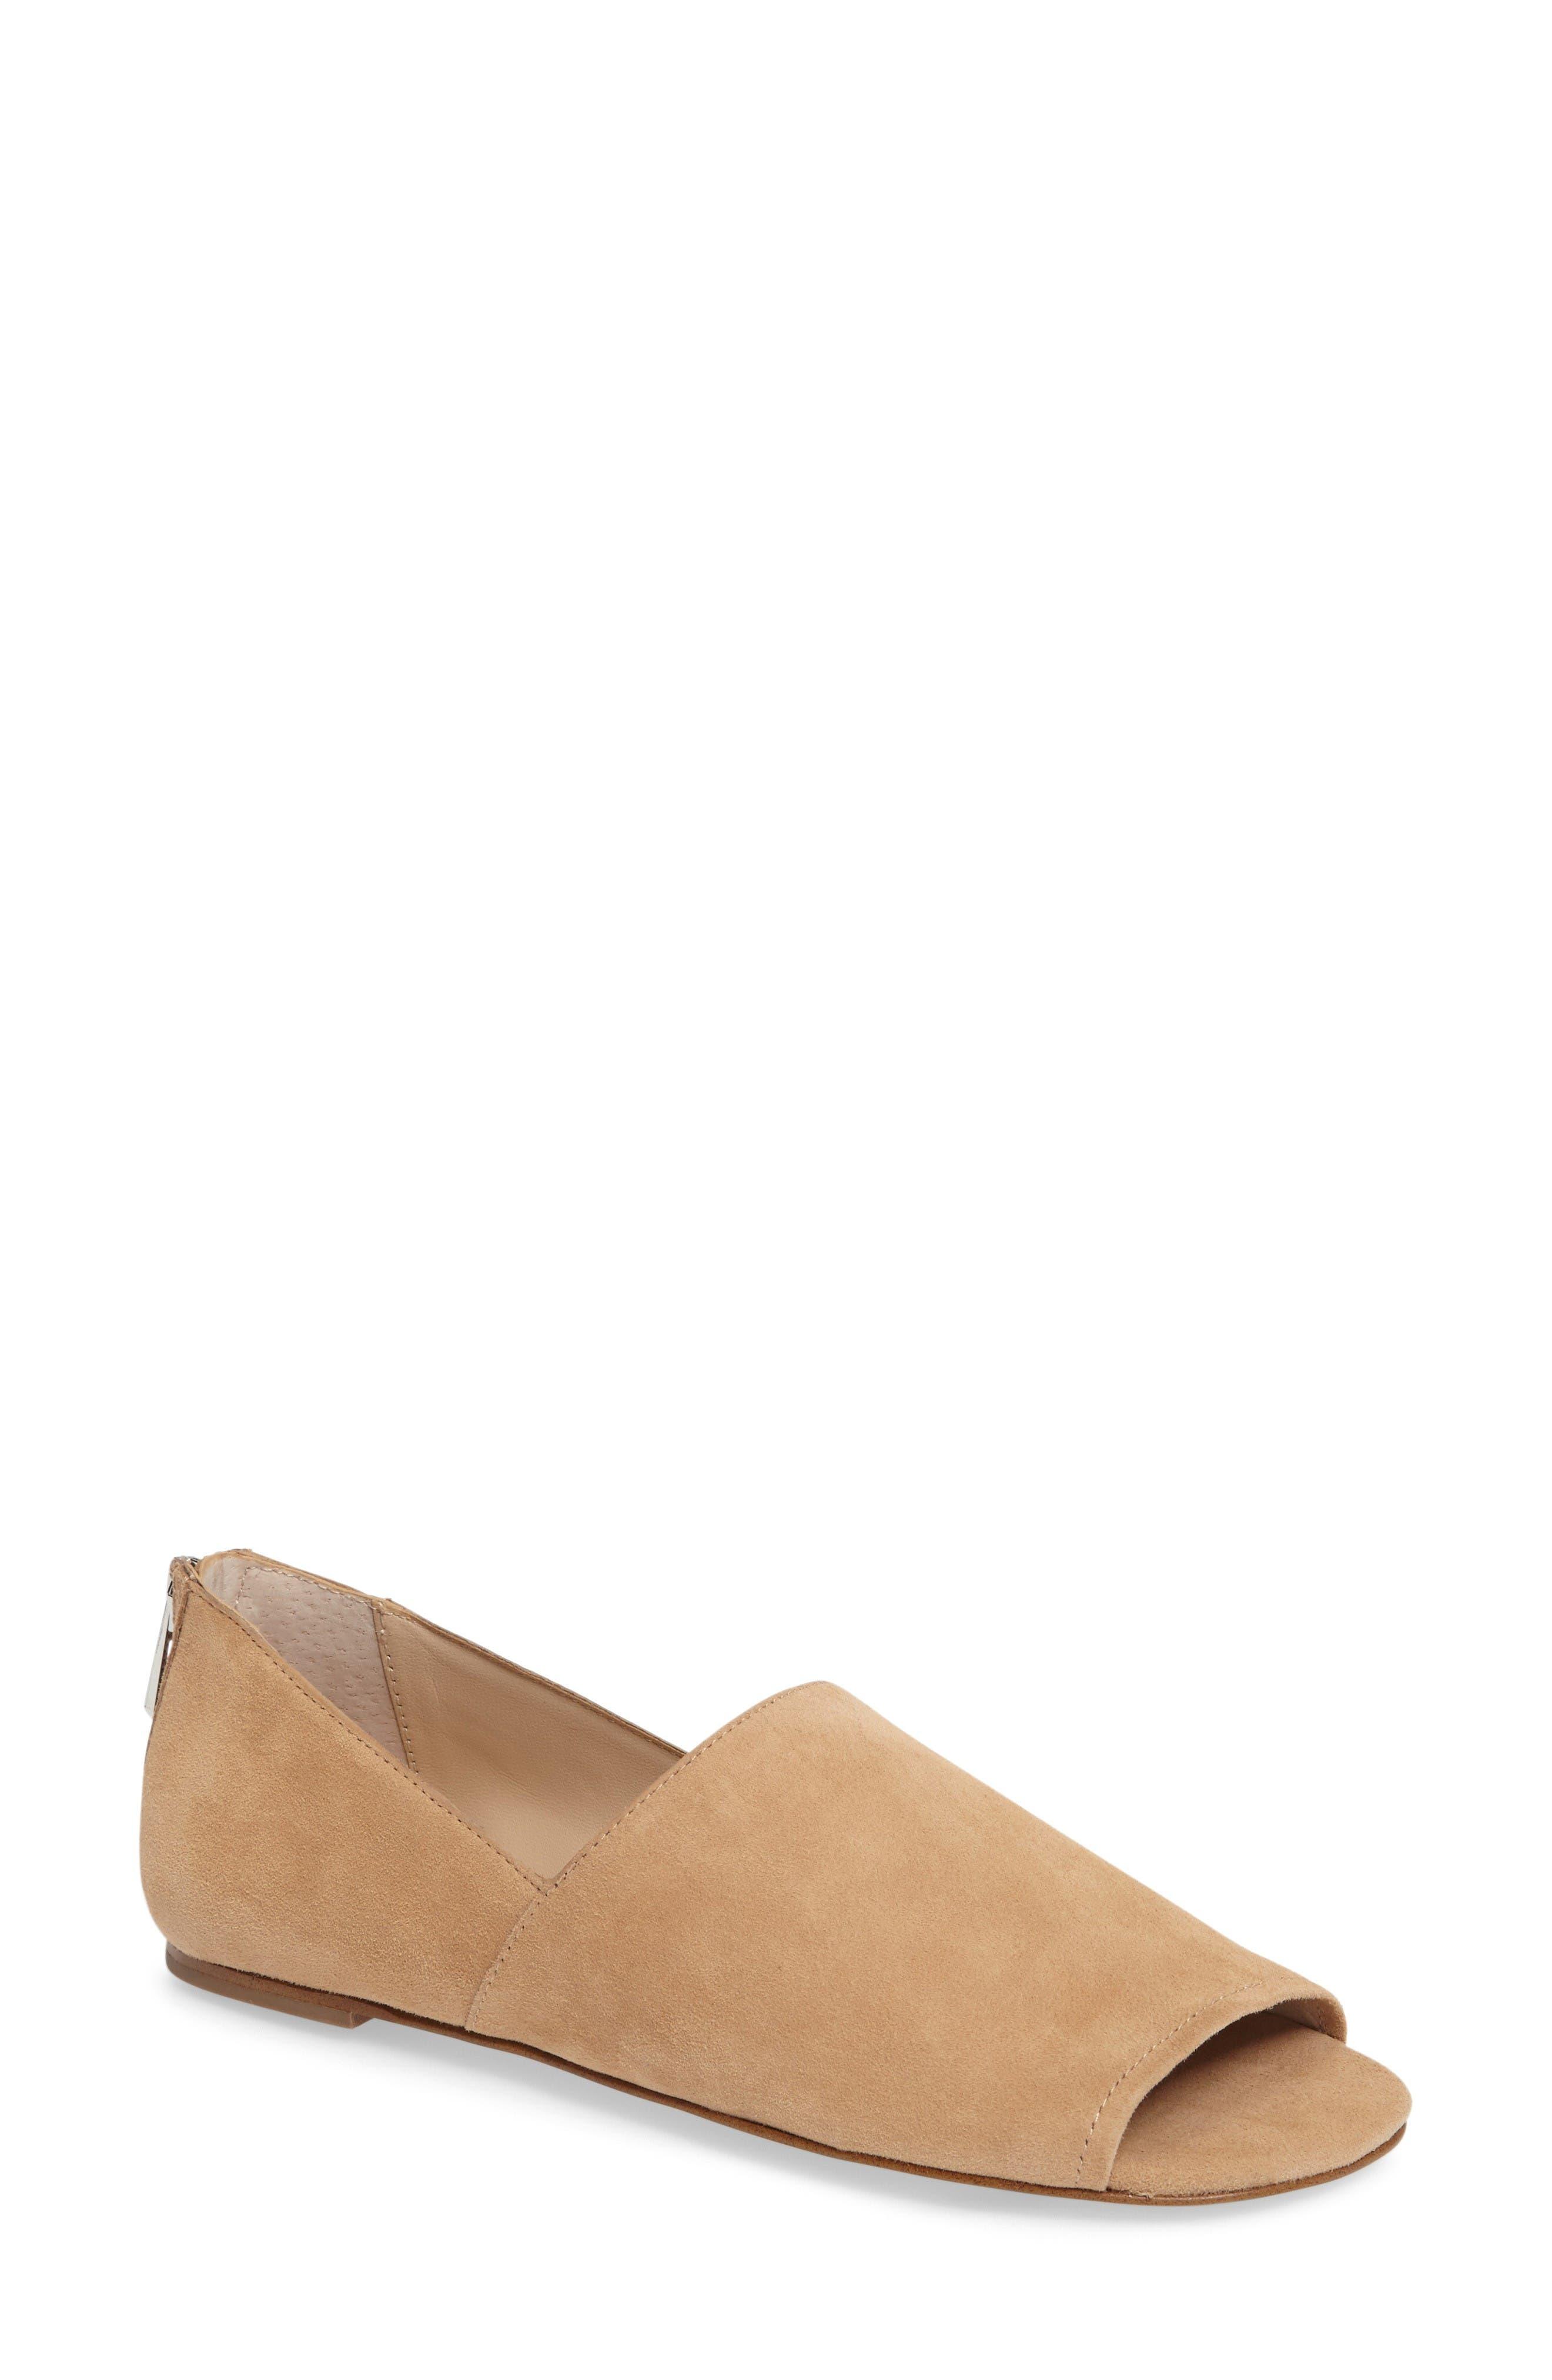 Maxine Peep Toe Flat,                         Main,                         color, Natural